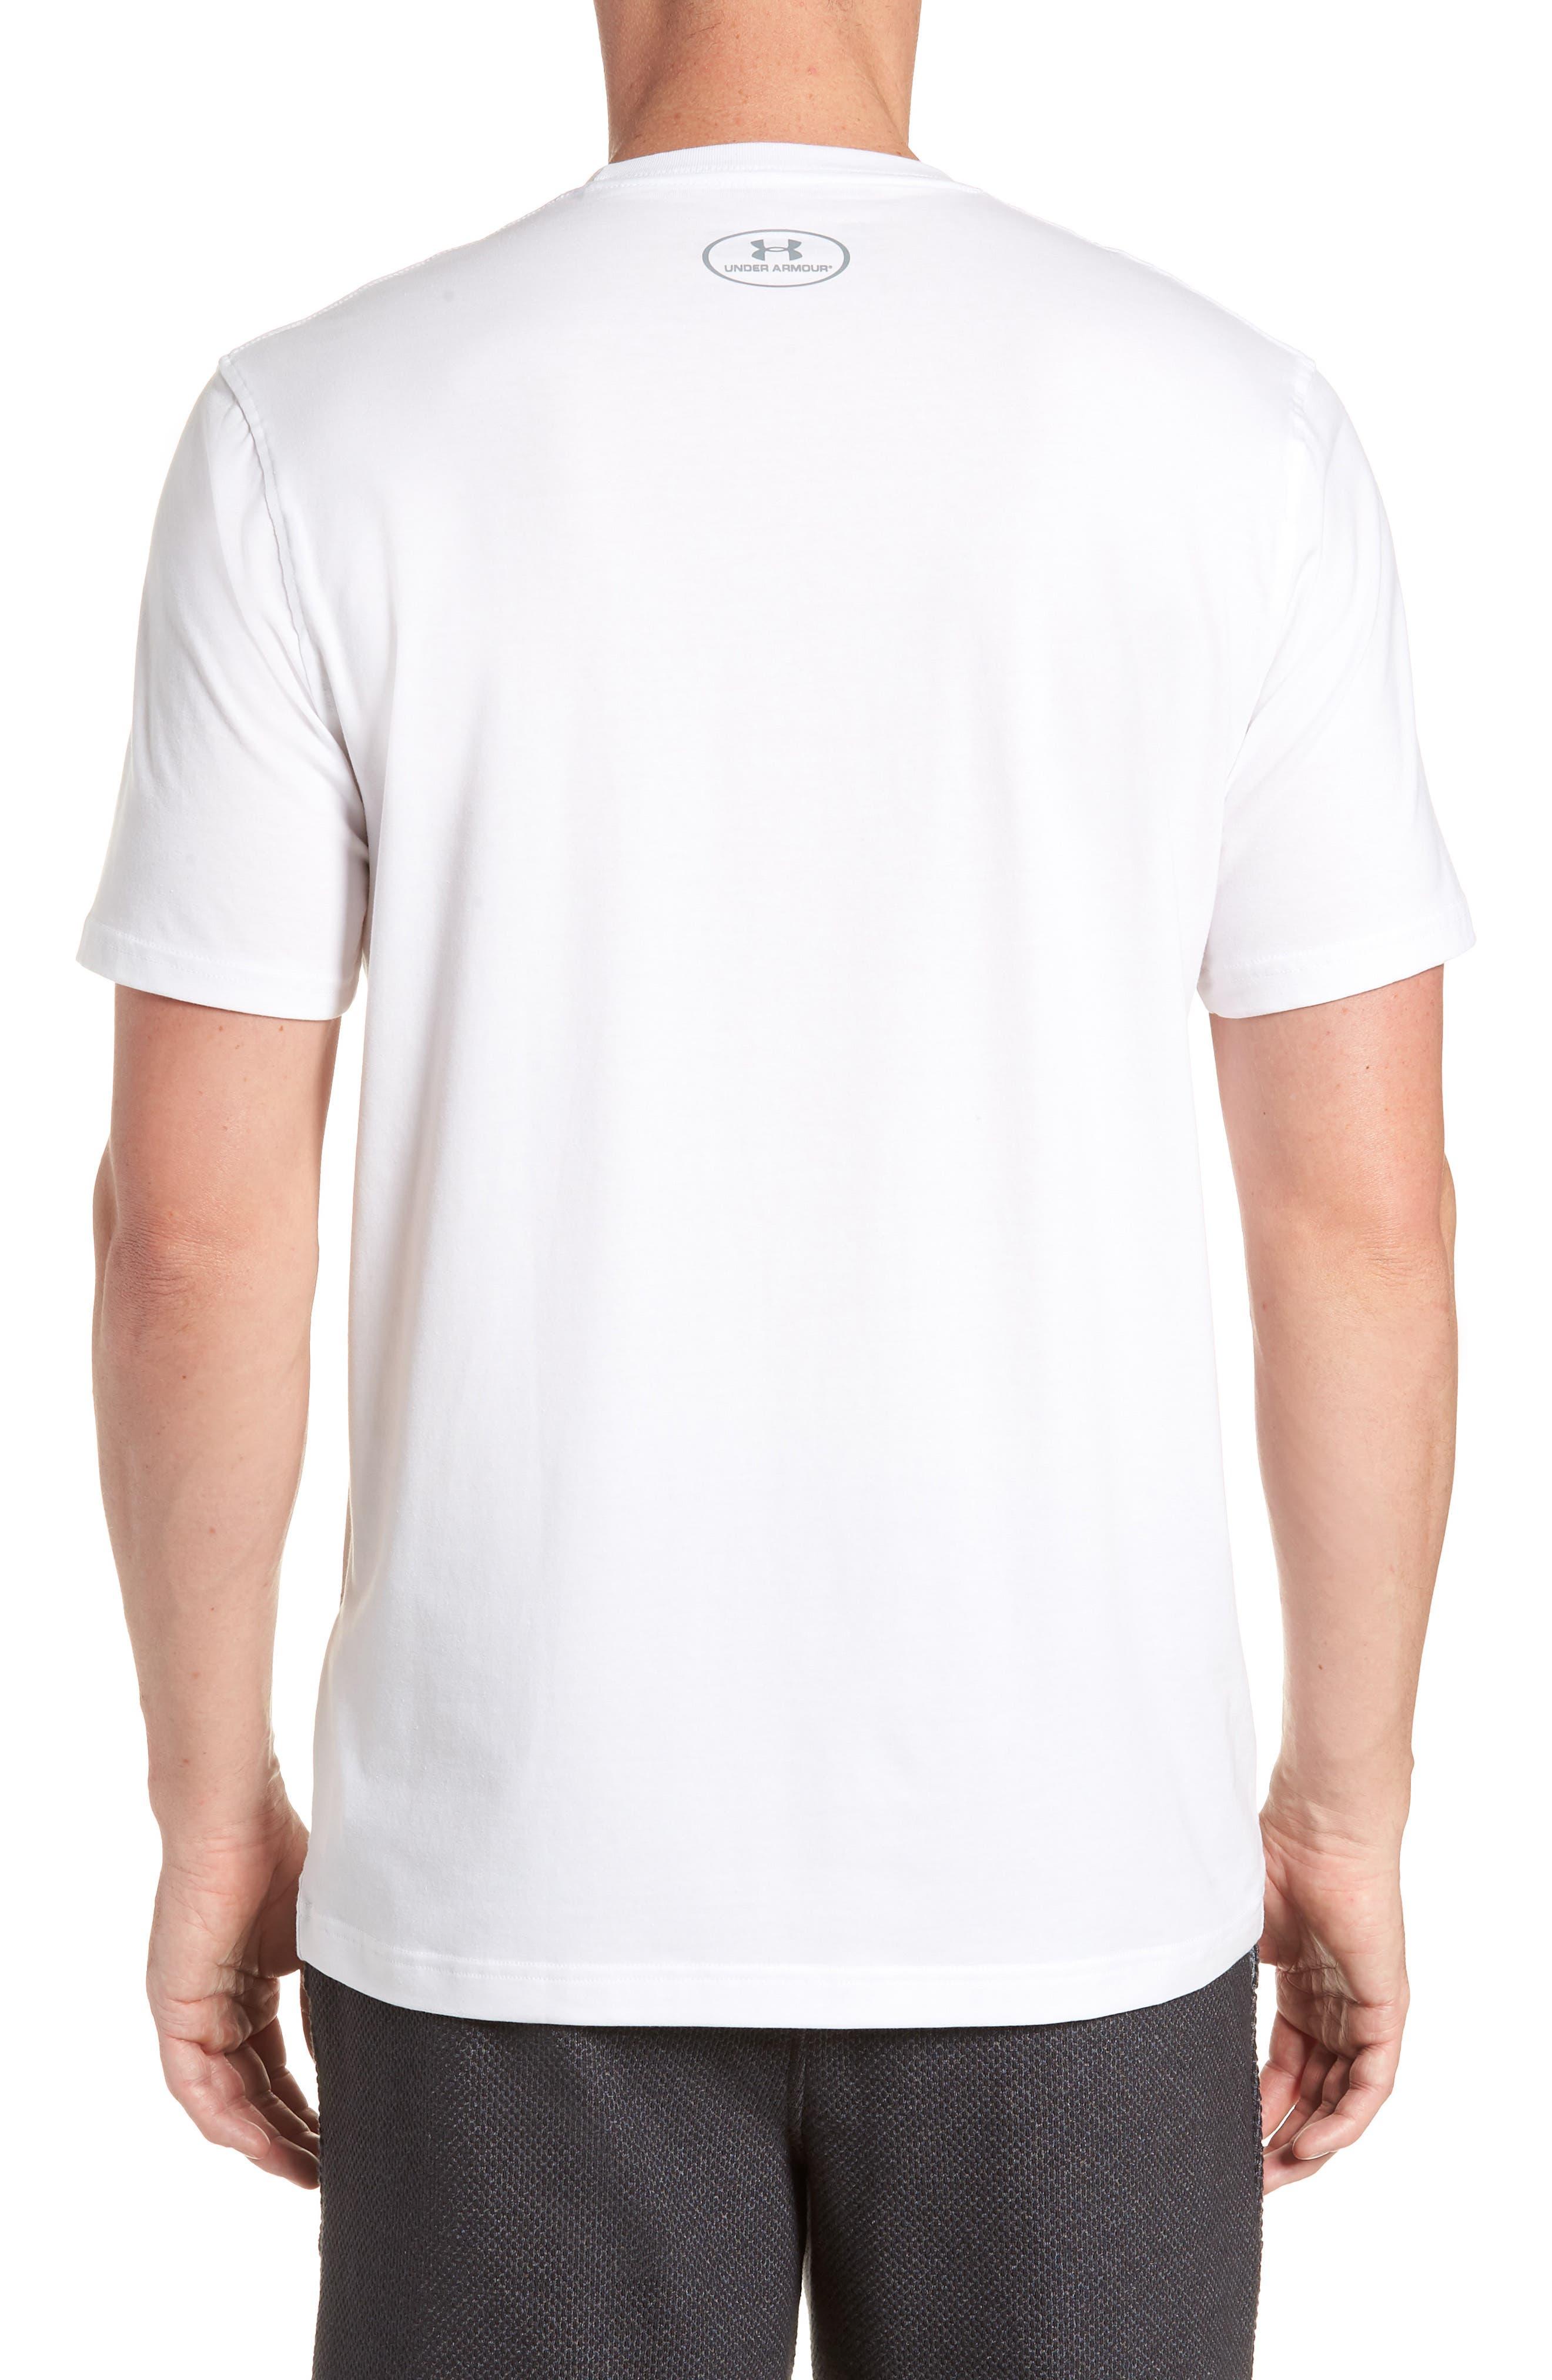 Trim Fit Vanish Logo T-Shirt,                             Alternate thumbnail 2, color,                             White/ Black/ Downtown Green